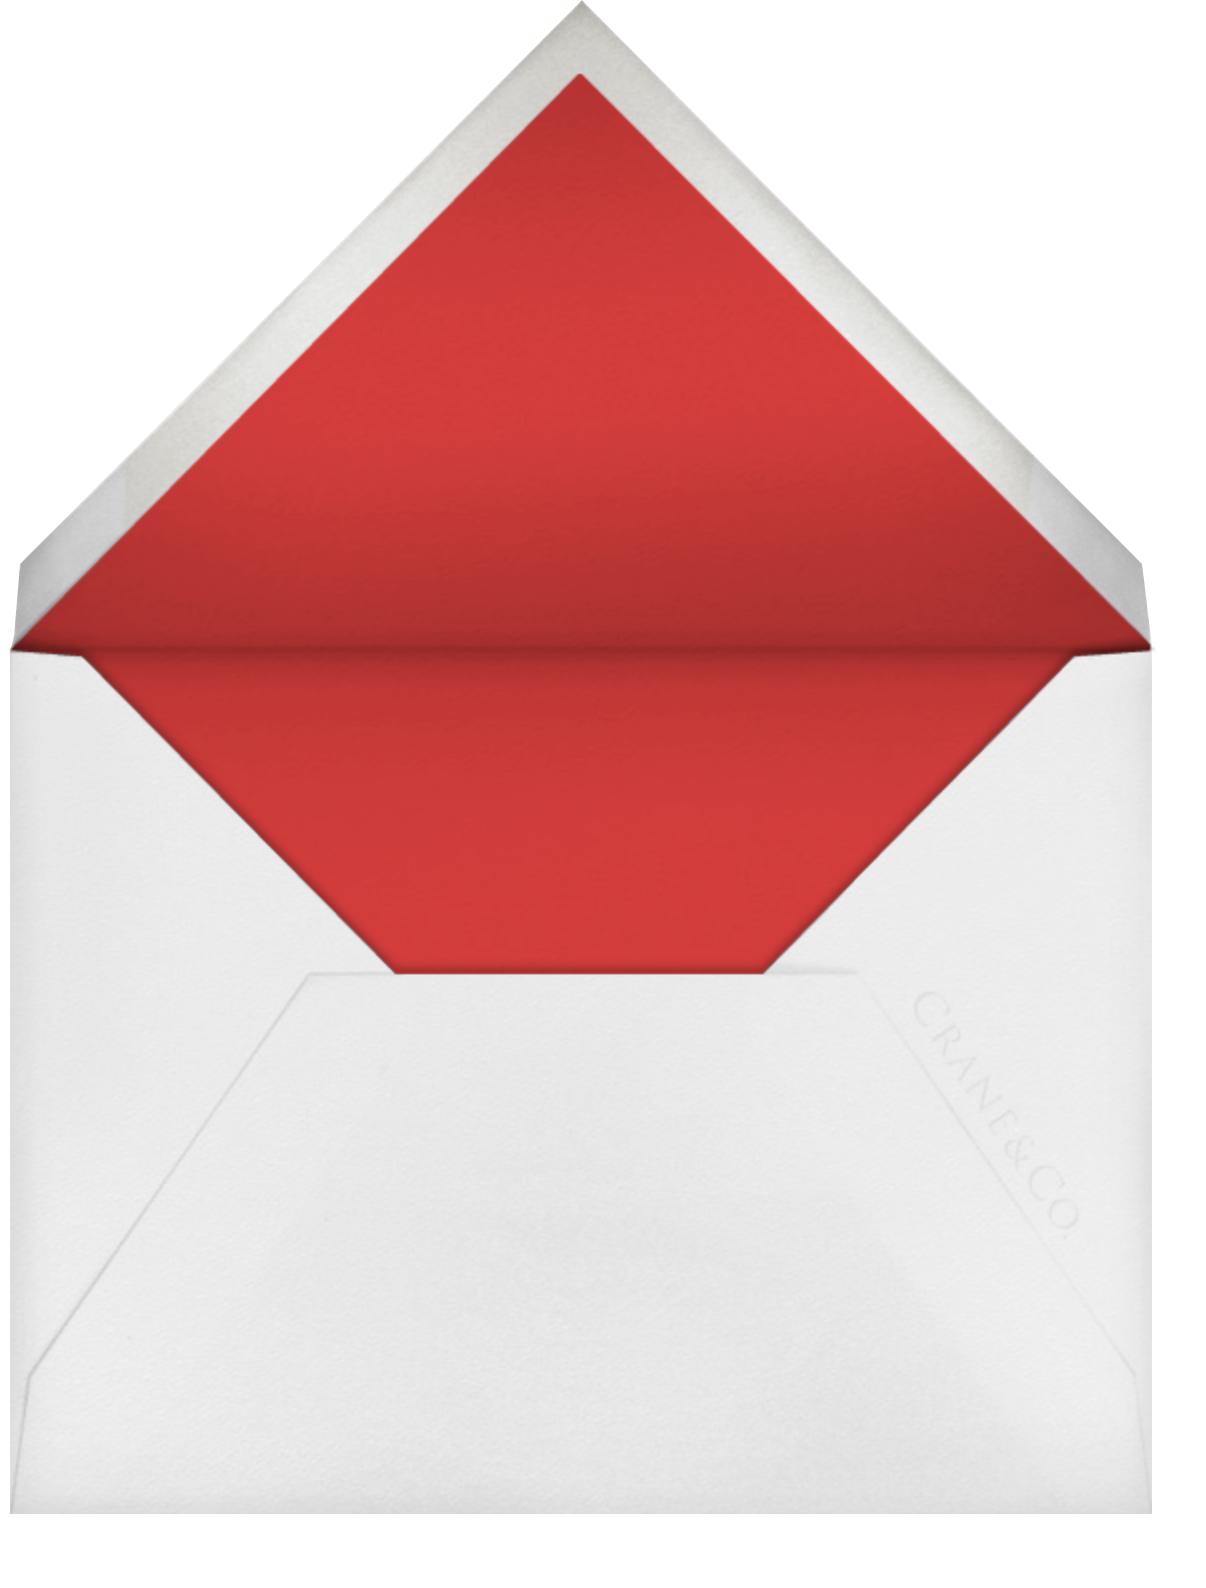 Alcazar (Save The Date) - Black - Crane & Co. - Party save the dates - envelope back